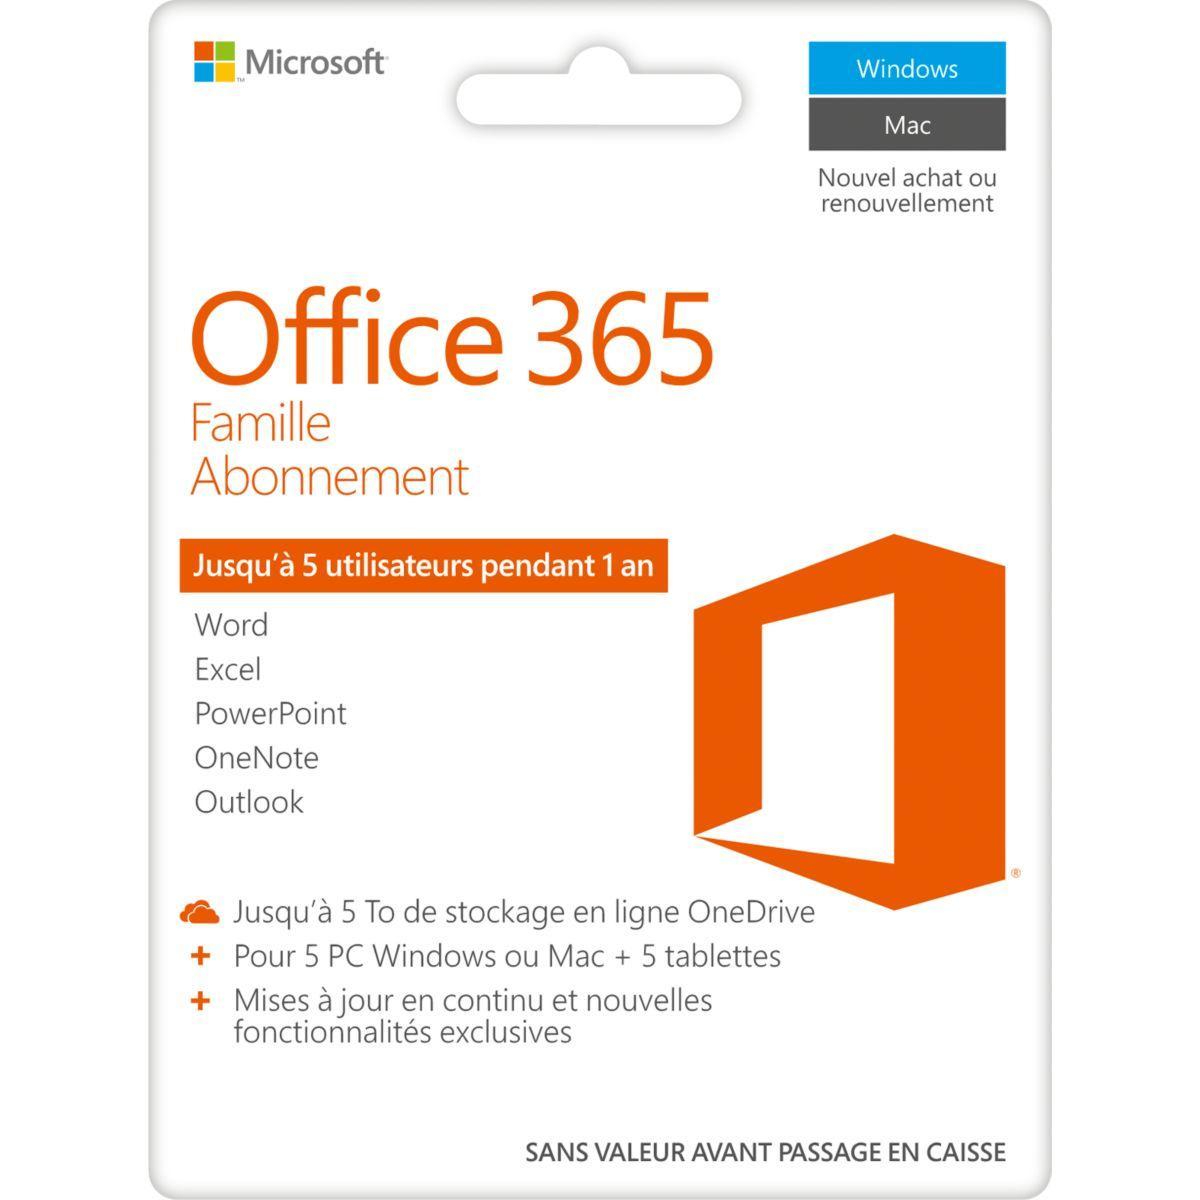 Logiciel de bureautique microsoft office 365 famille - 10% de ...